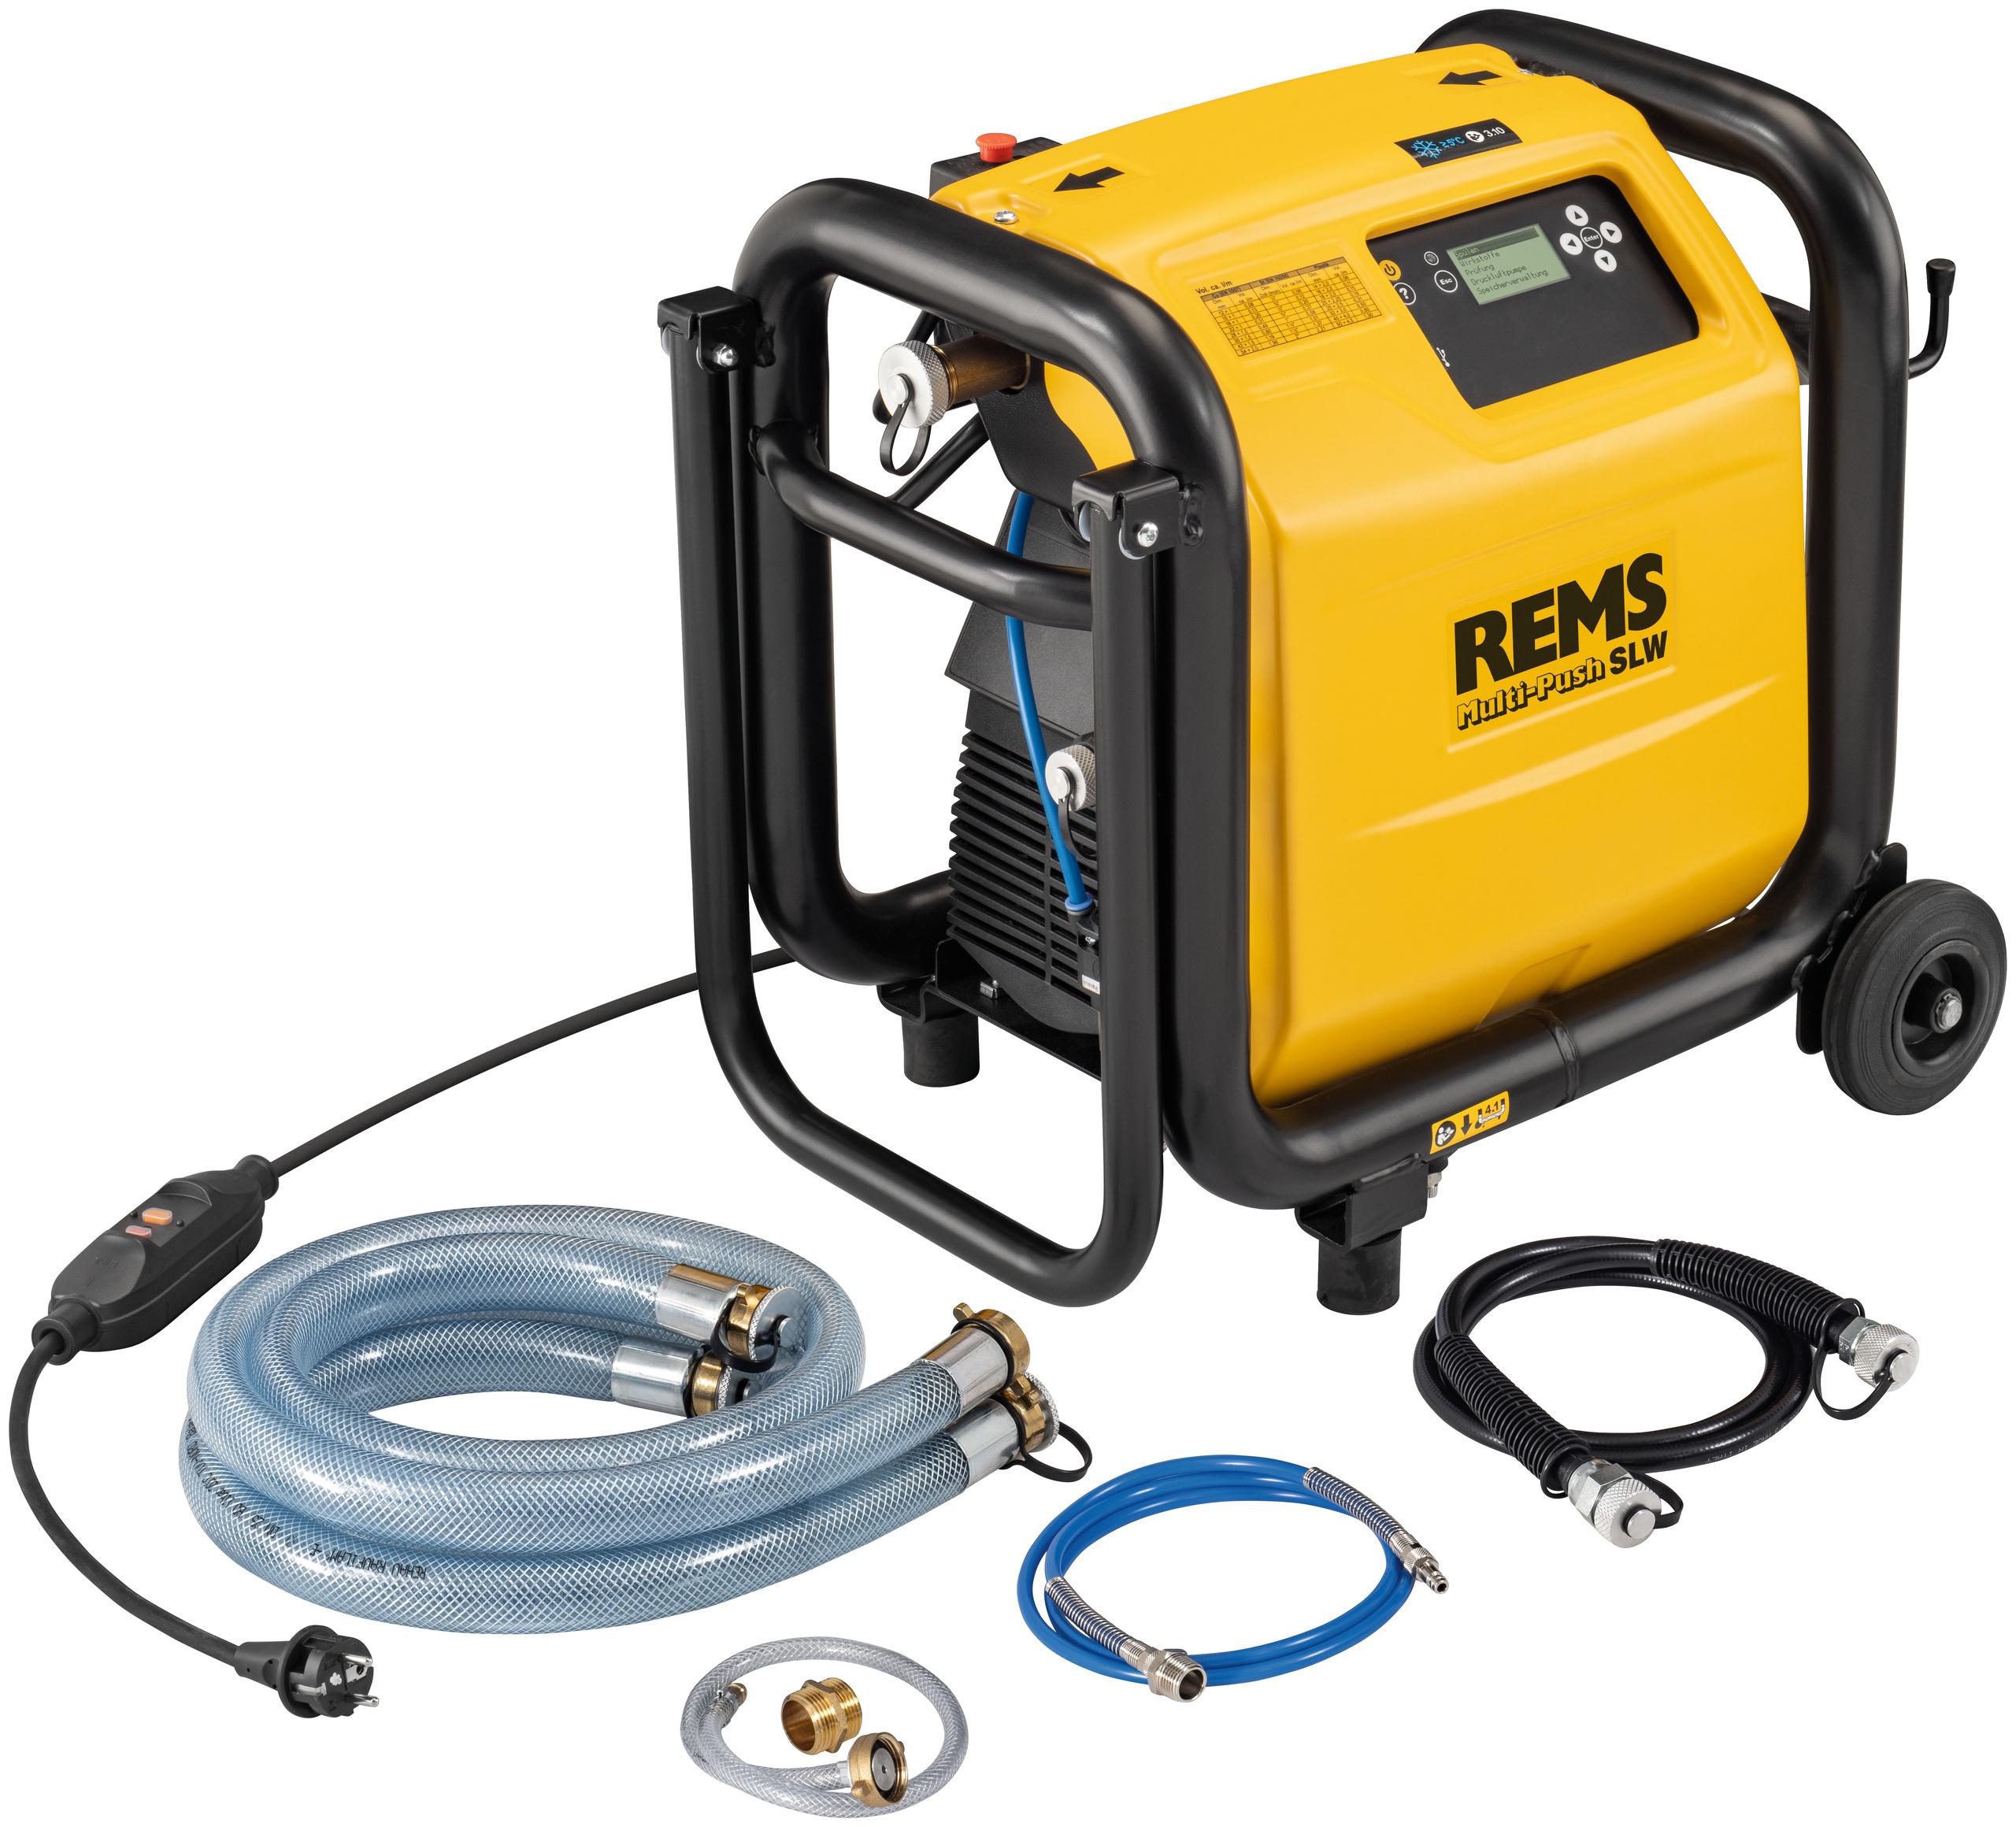 <br/>REMS Multi-Push SLW Set